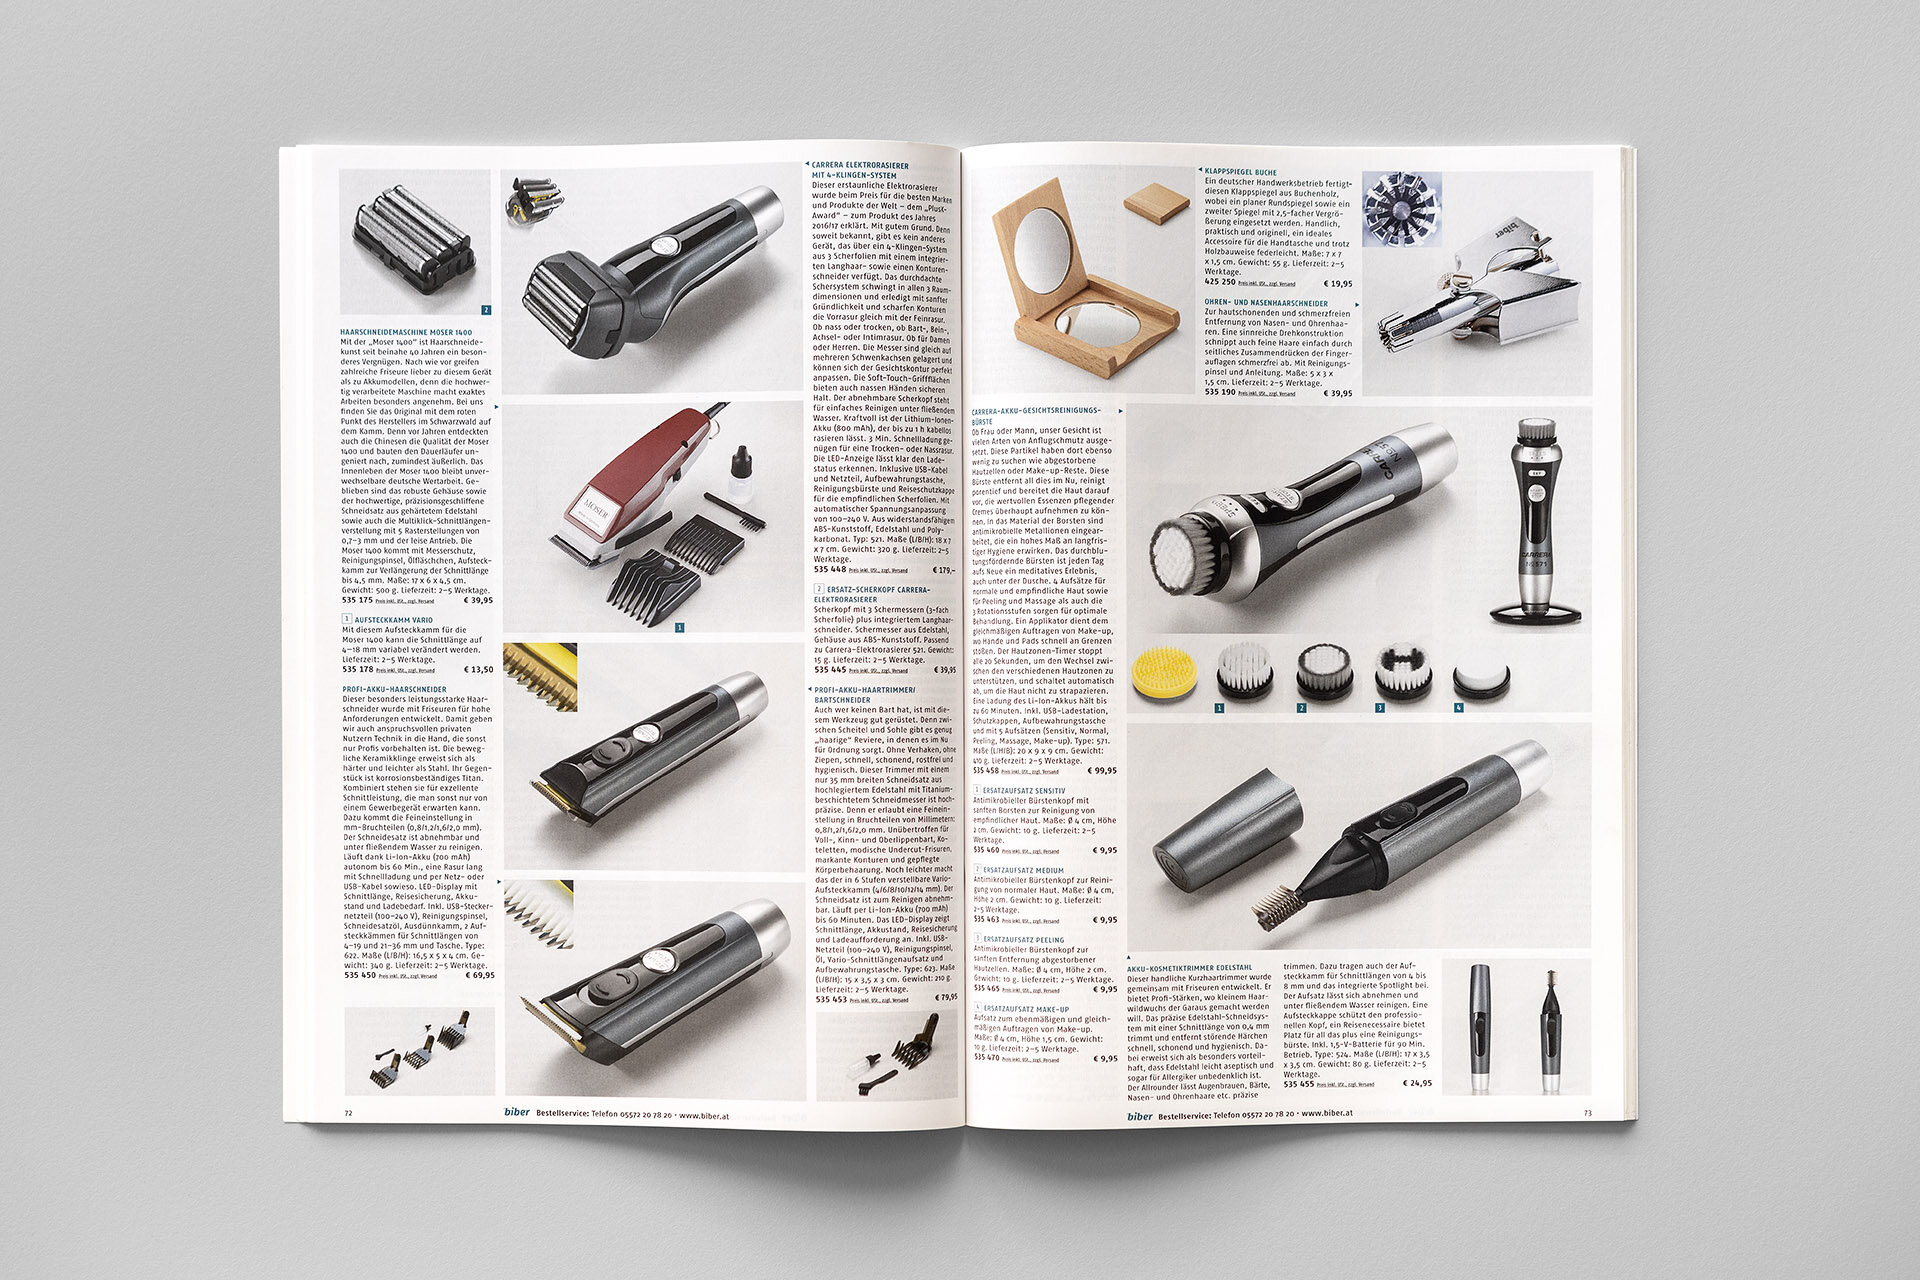 Fotowerk Produktfotografie - Aufgeräumte Katalogseite beim Biber Versand